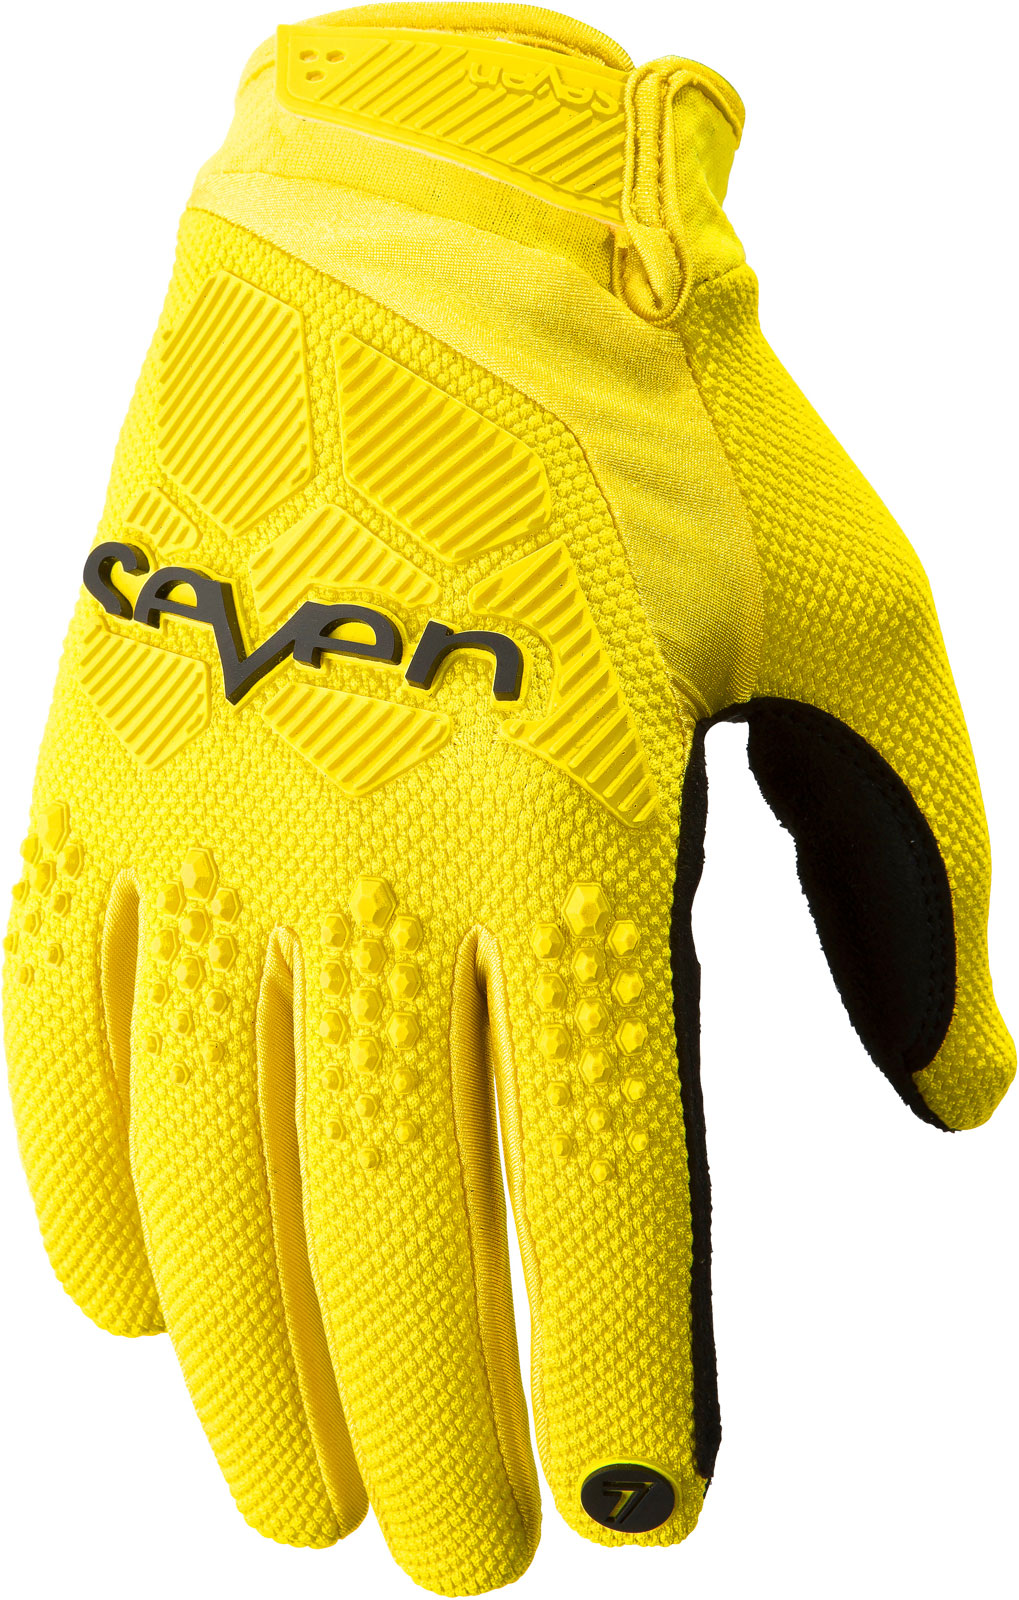 Mens yellow gloves - Seven Mx Rival Gloves Motocross Dirtbike Offroad Atv